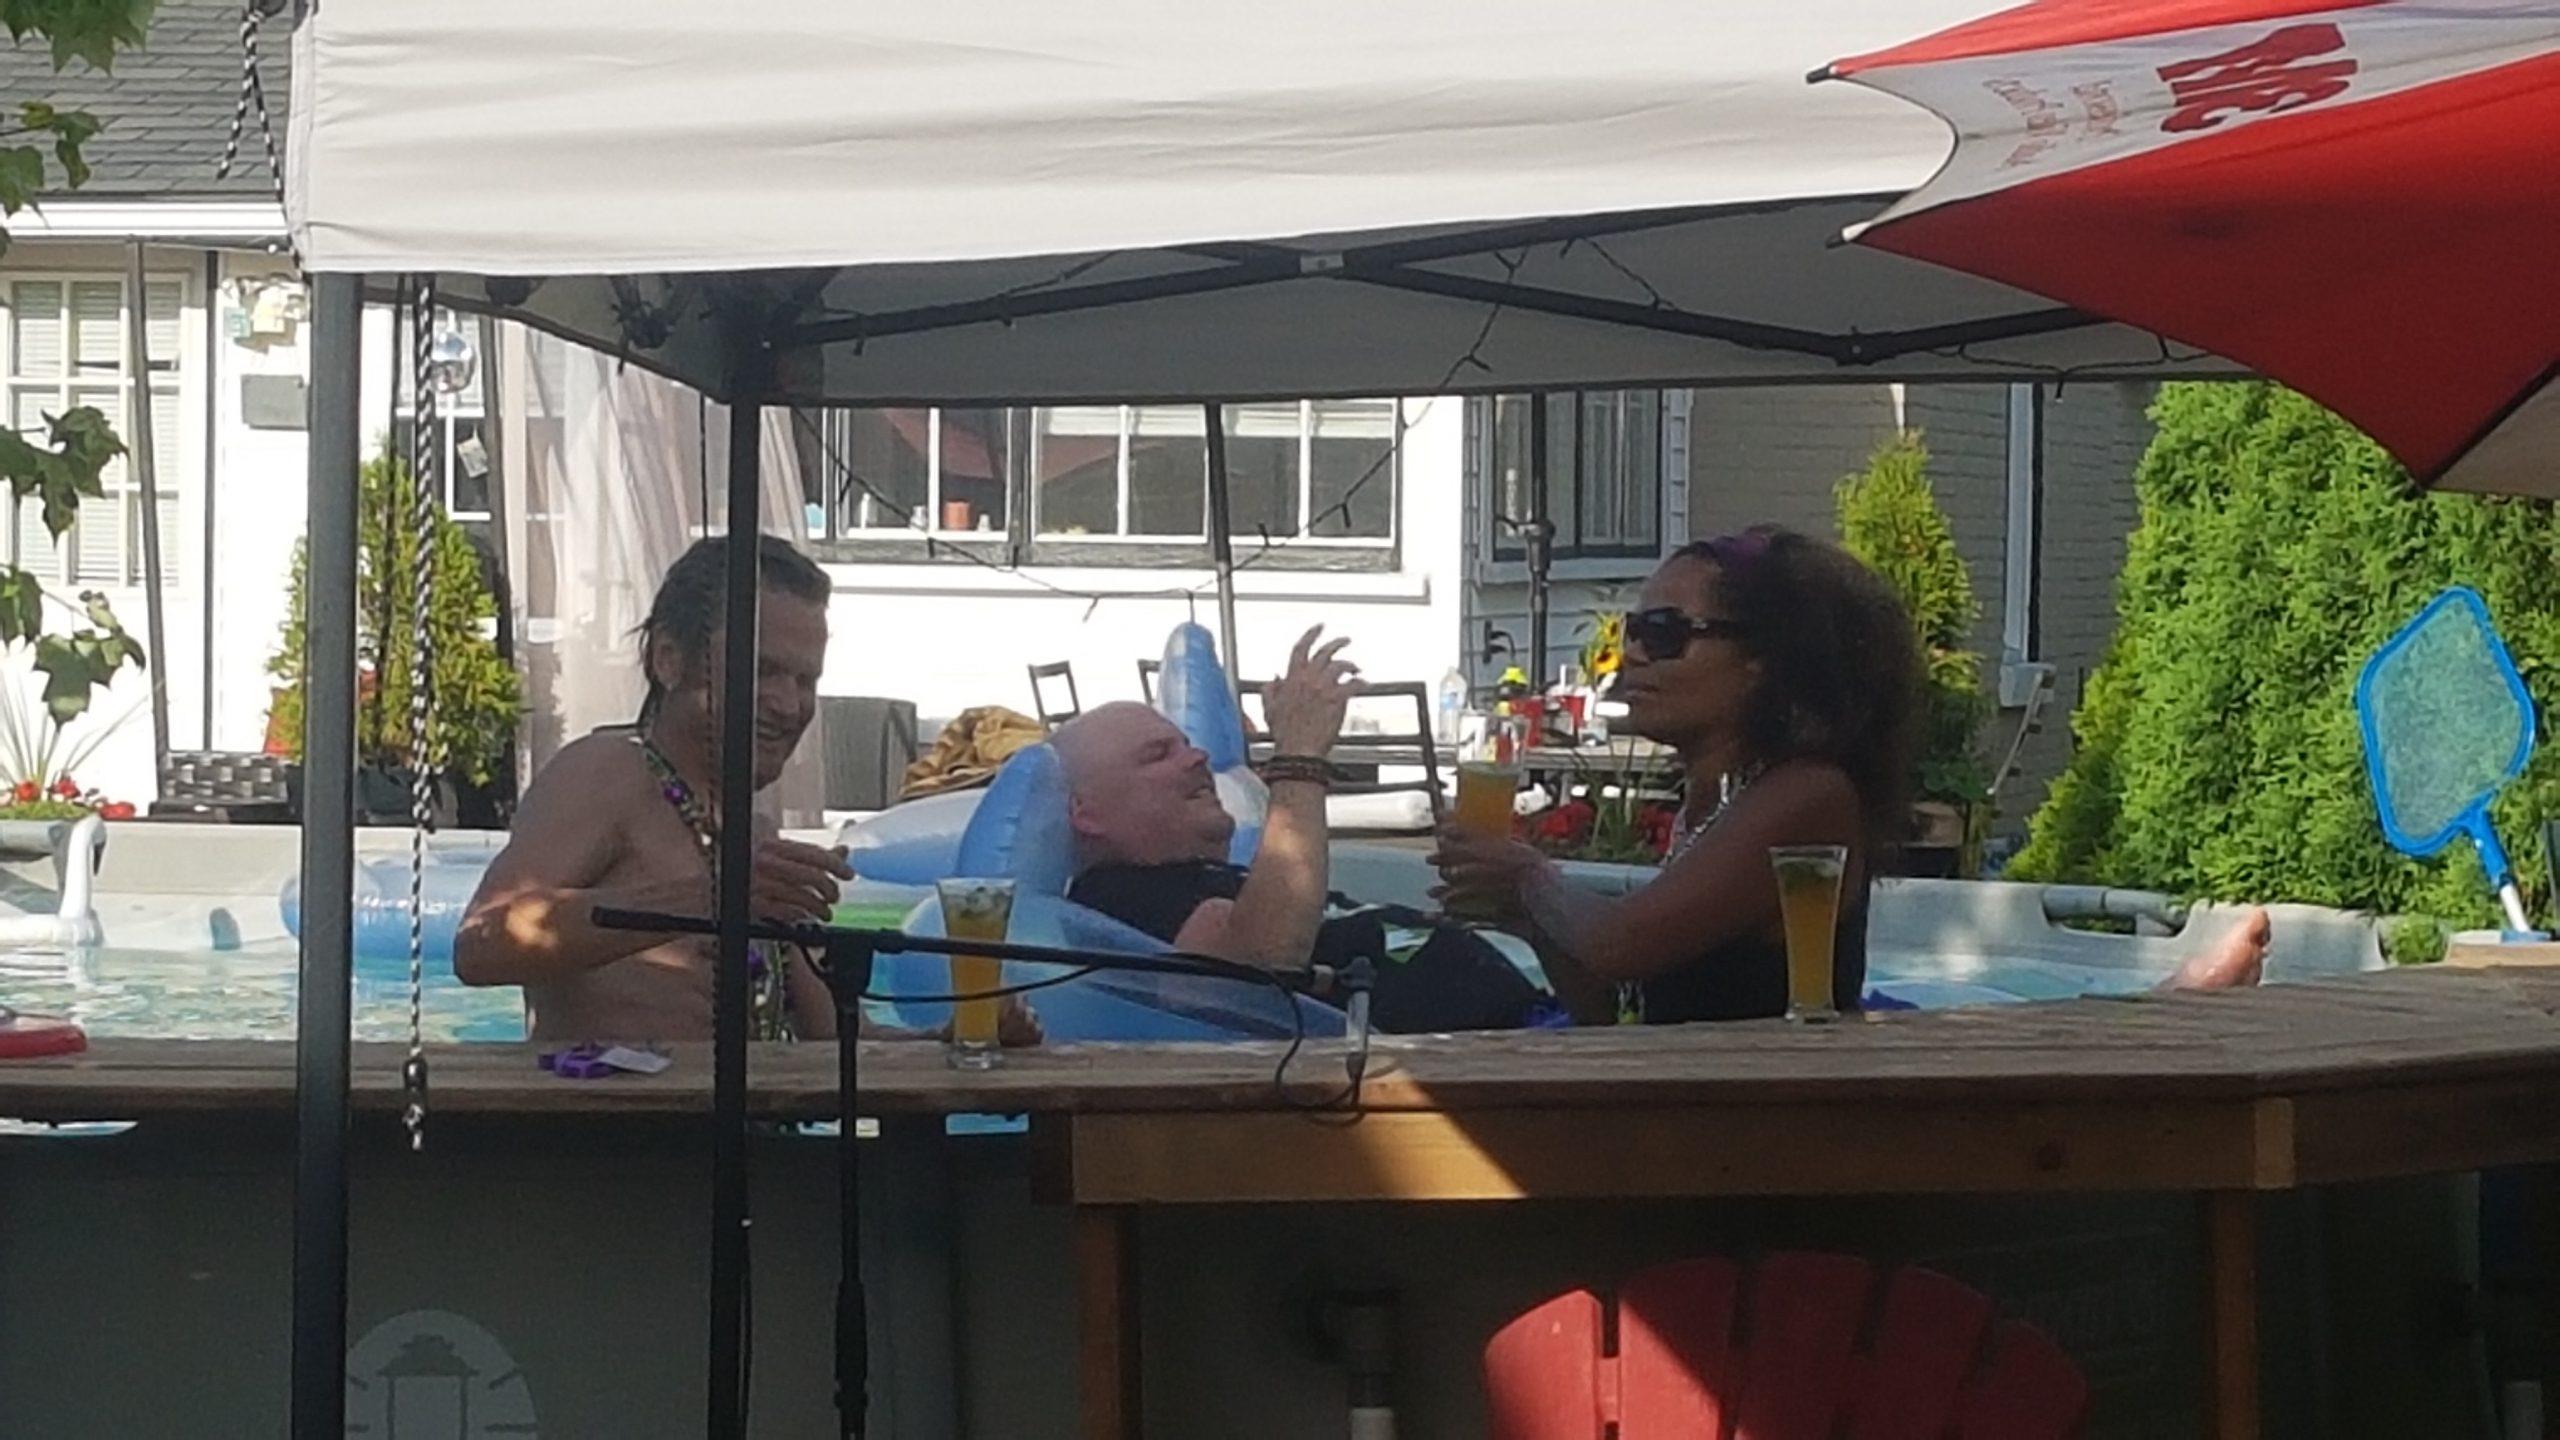 Juliet Dunn, Peter Shea, and Ronnie Littlejohn - Niagara's ONLINE Summer Mardi Gras - Saturday, July 18, 2020. Photo: Nicholas Paolone